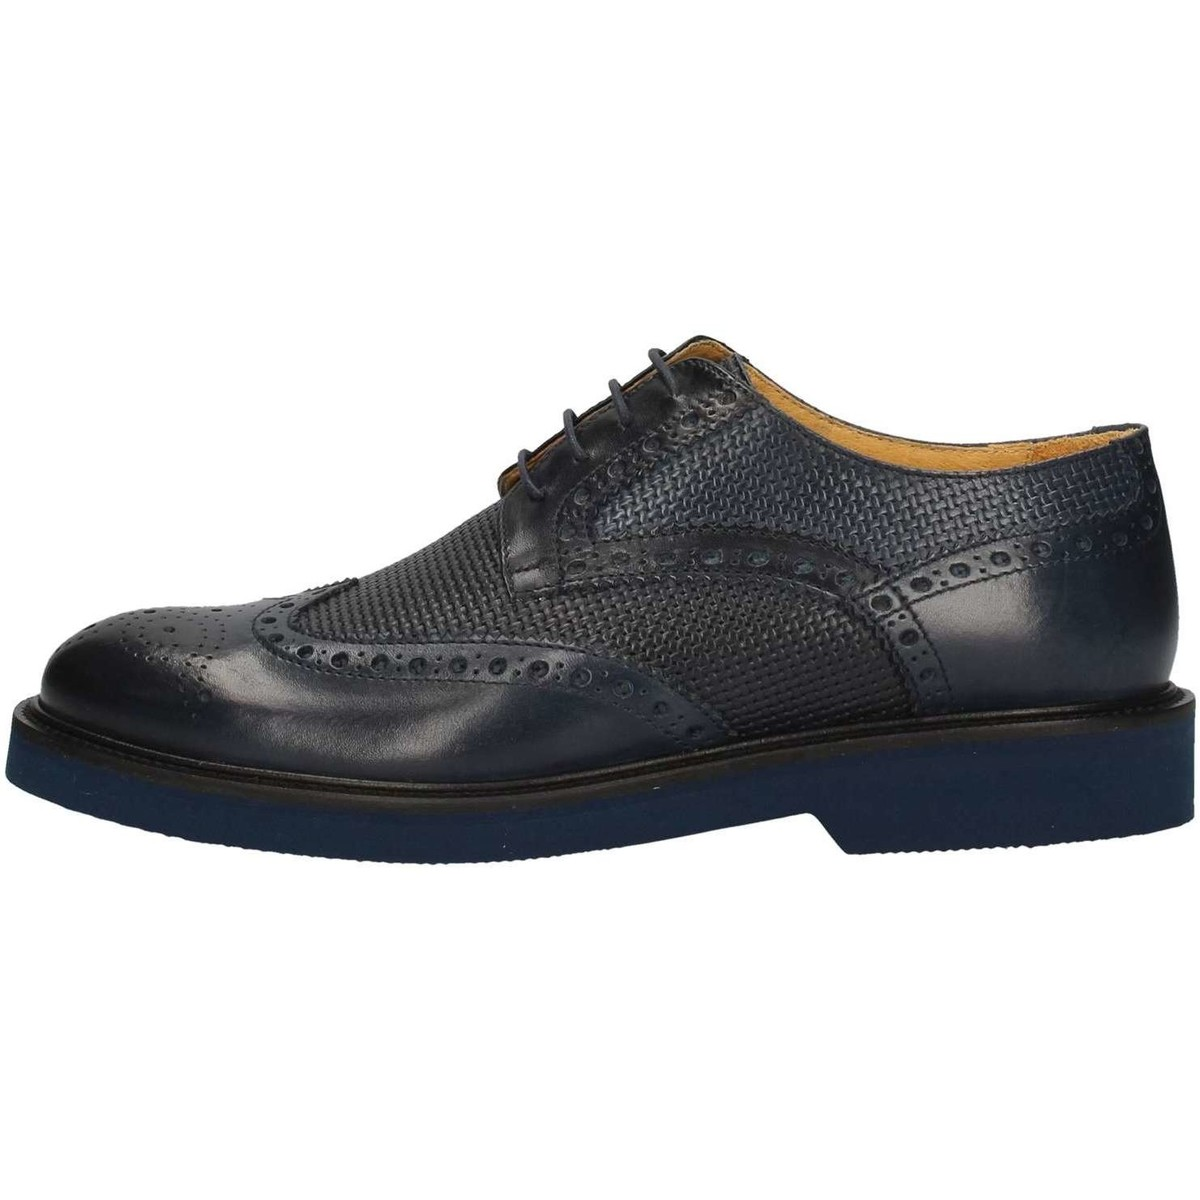 Hudson 917 Lace up shoes Mann Blau Blau - Schuhe Derby-Schuhe Herren 104,00 €